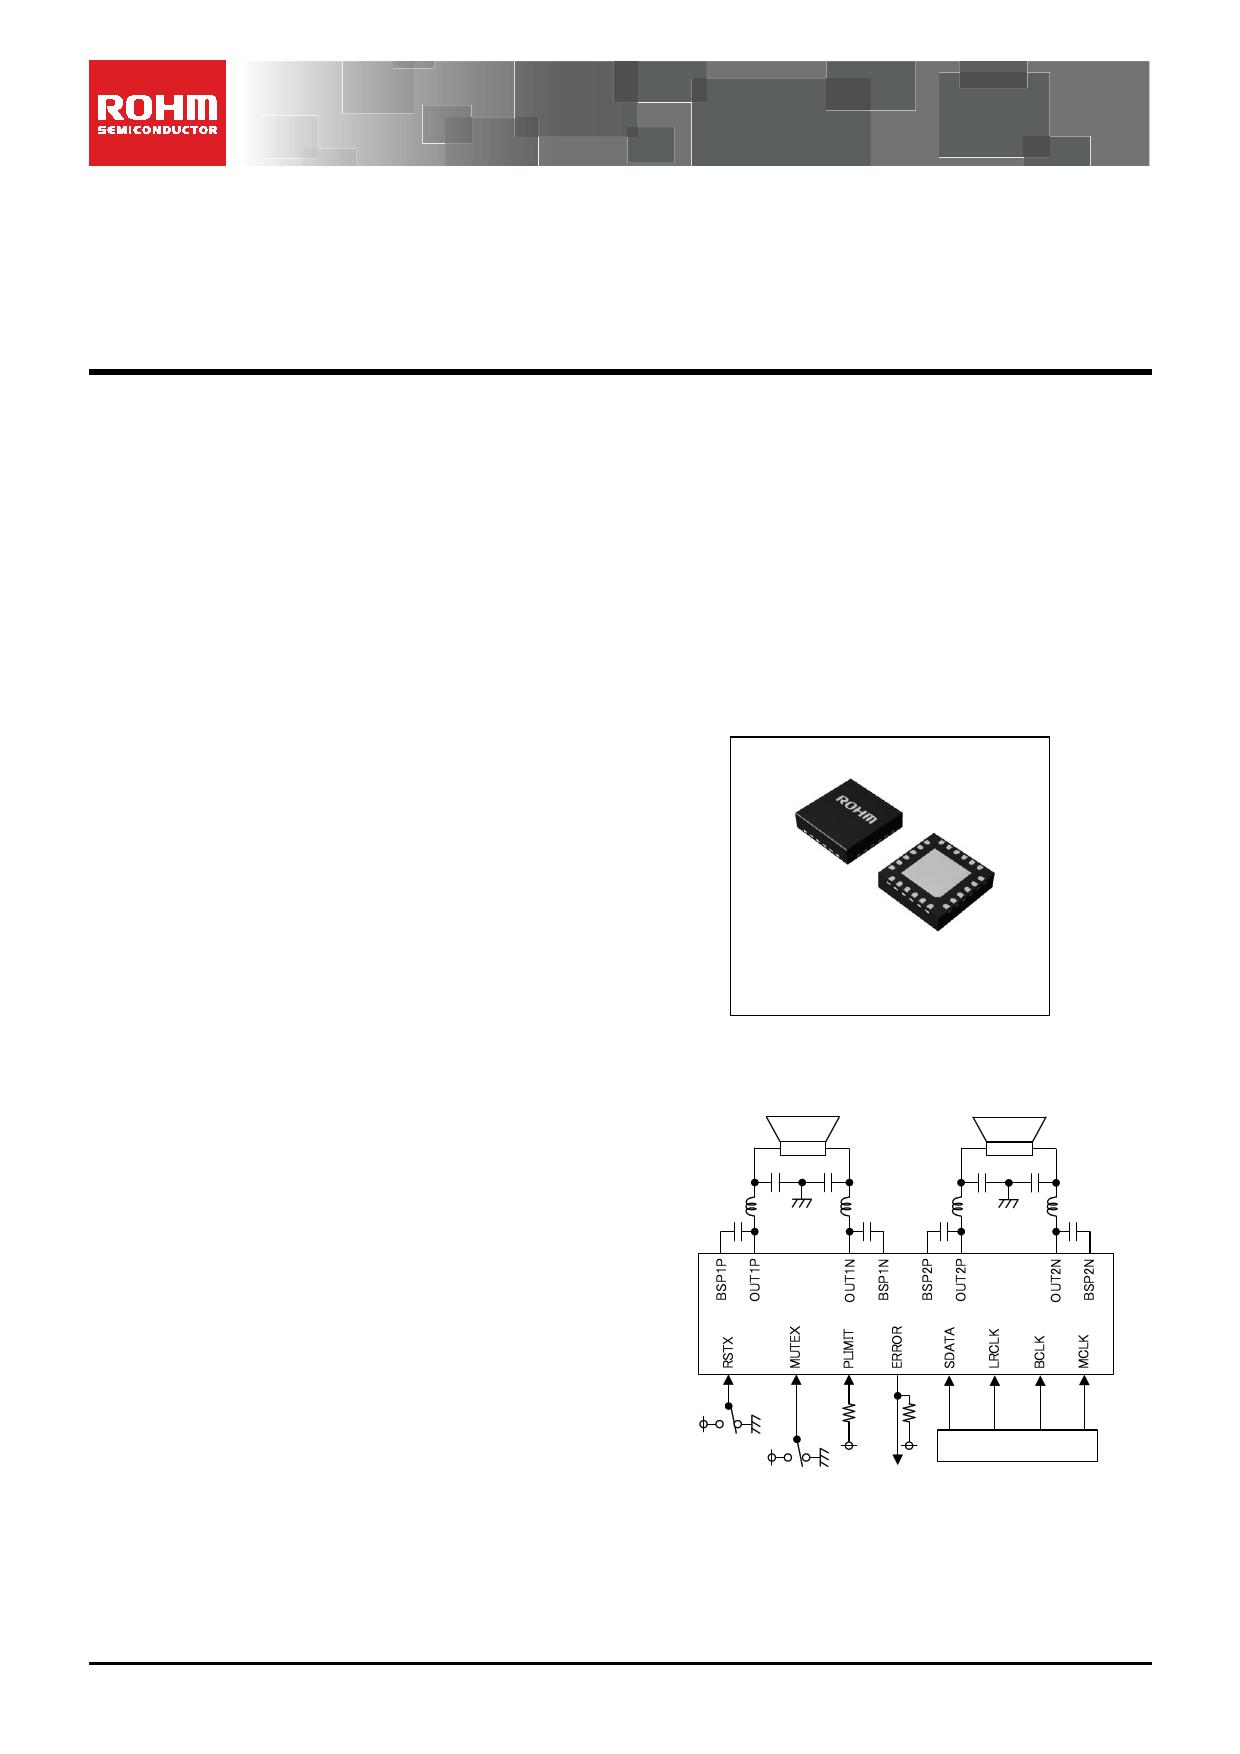 BD28620MUV datasheet